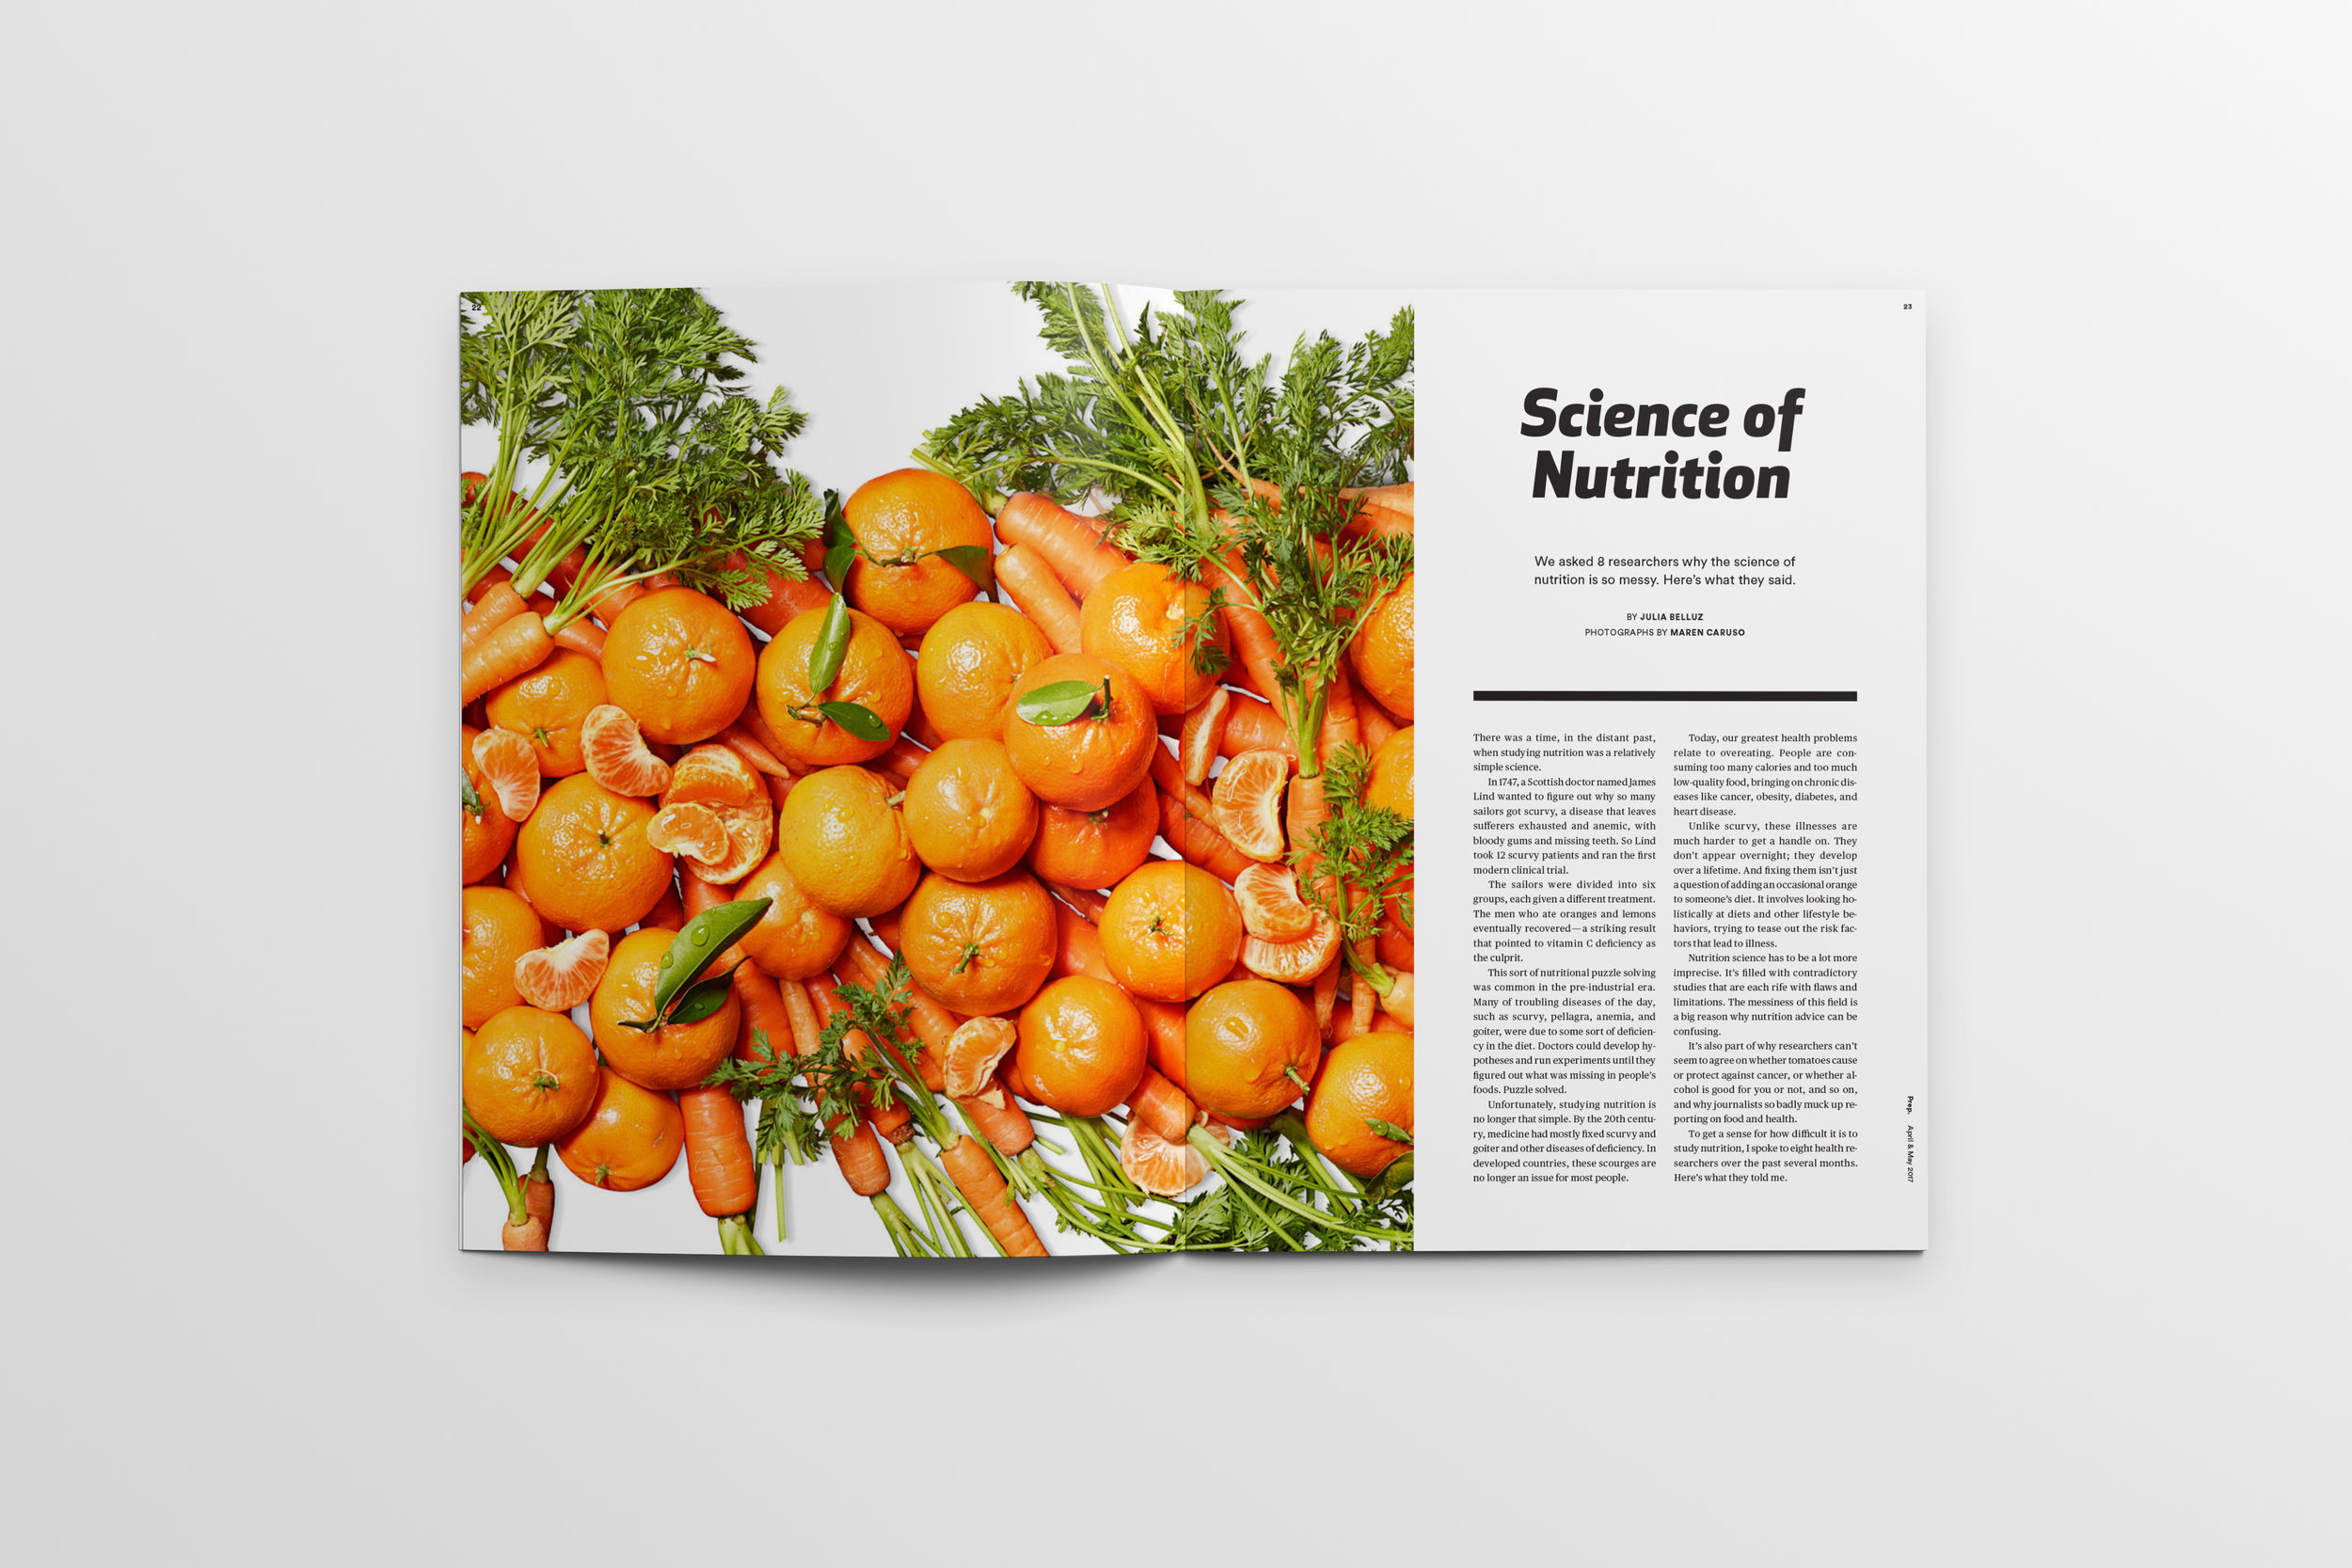 Magazine_Mockup_Pages21-22.jpg